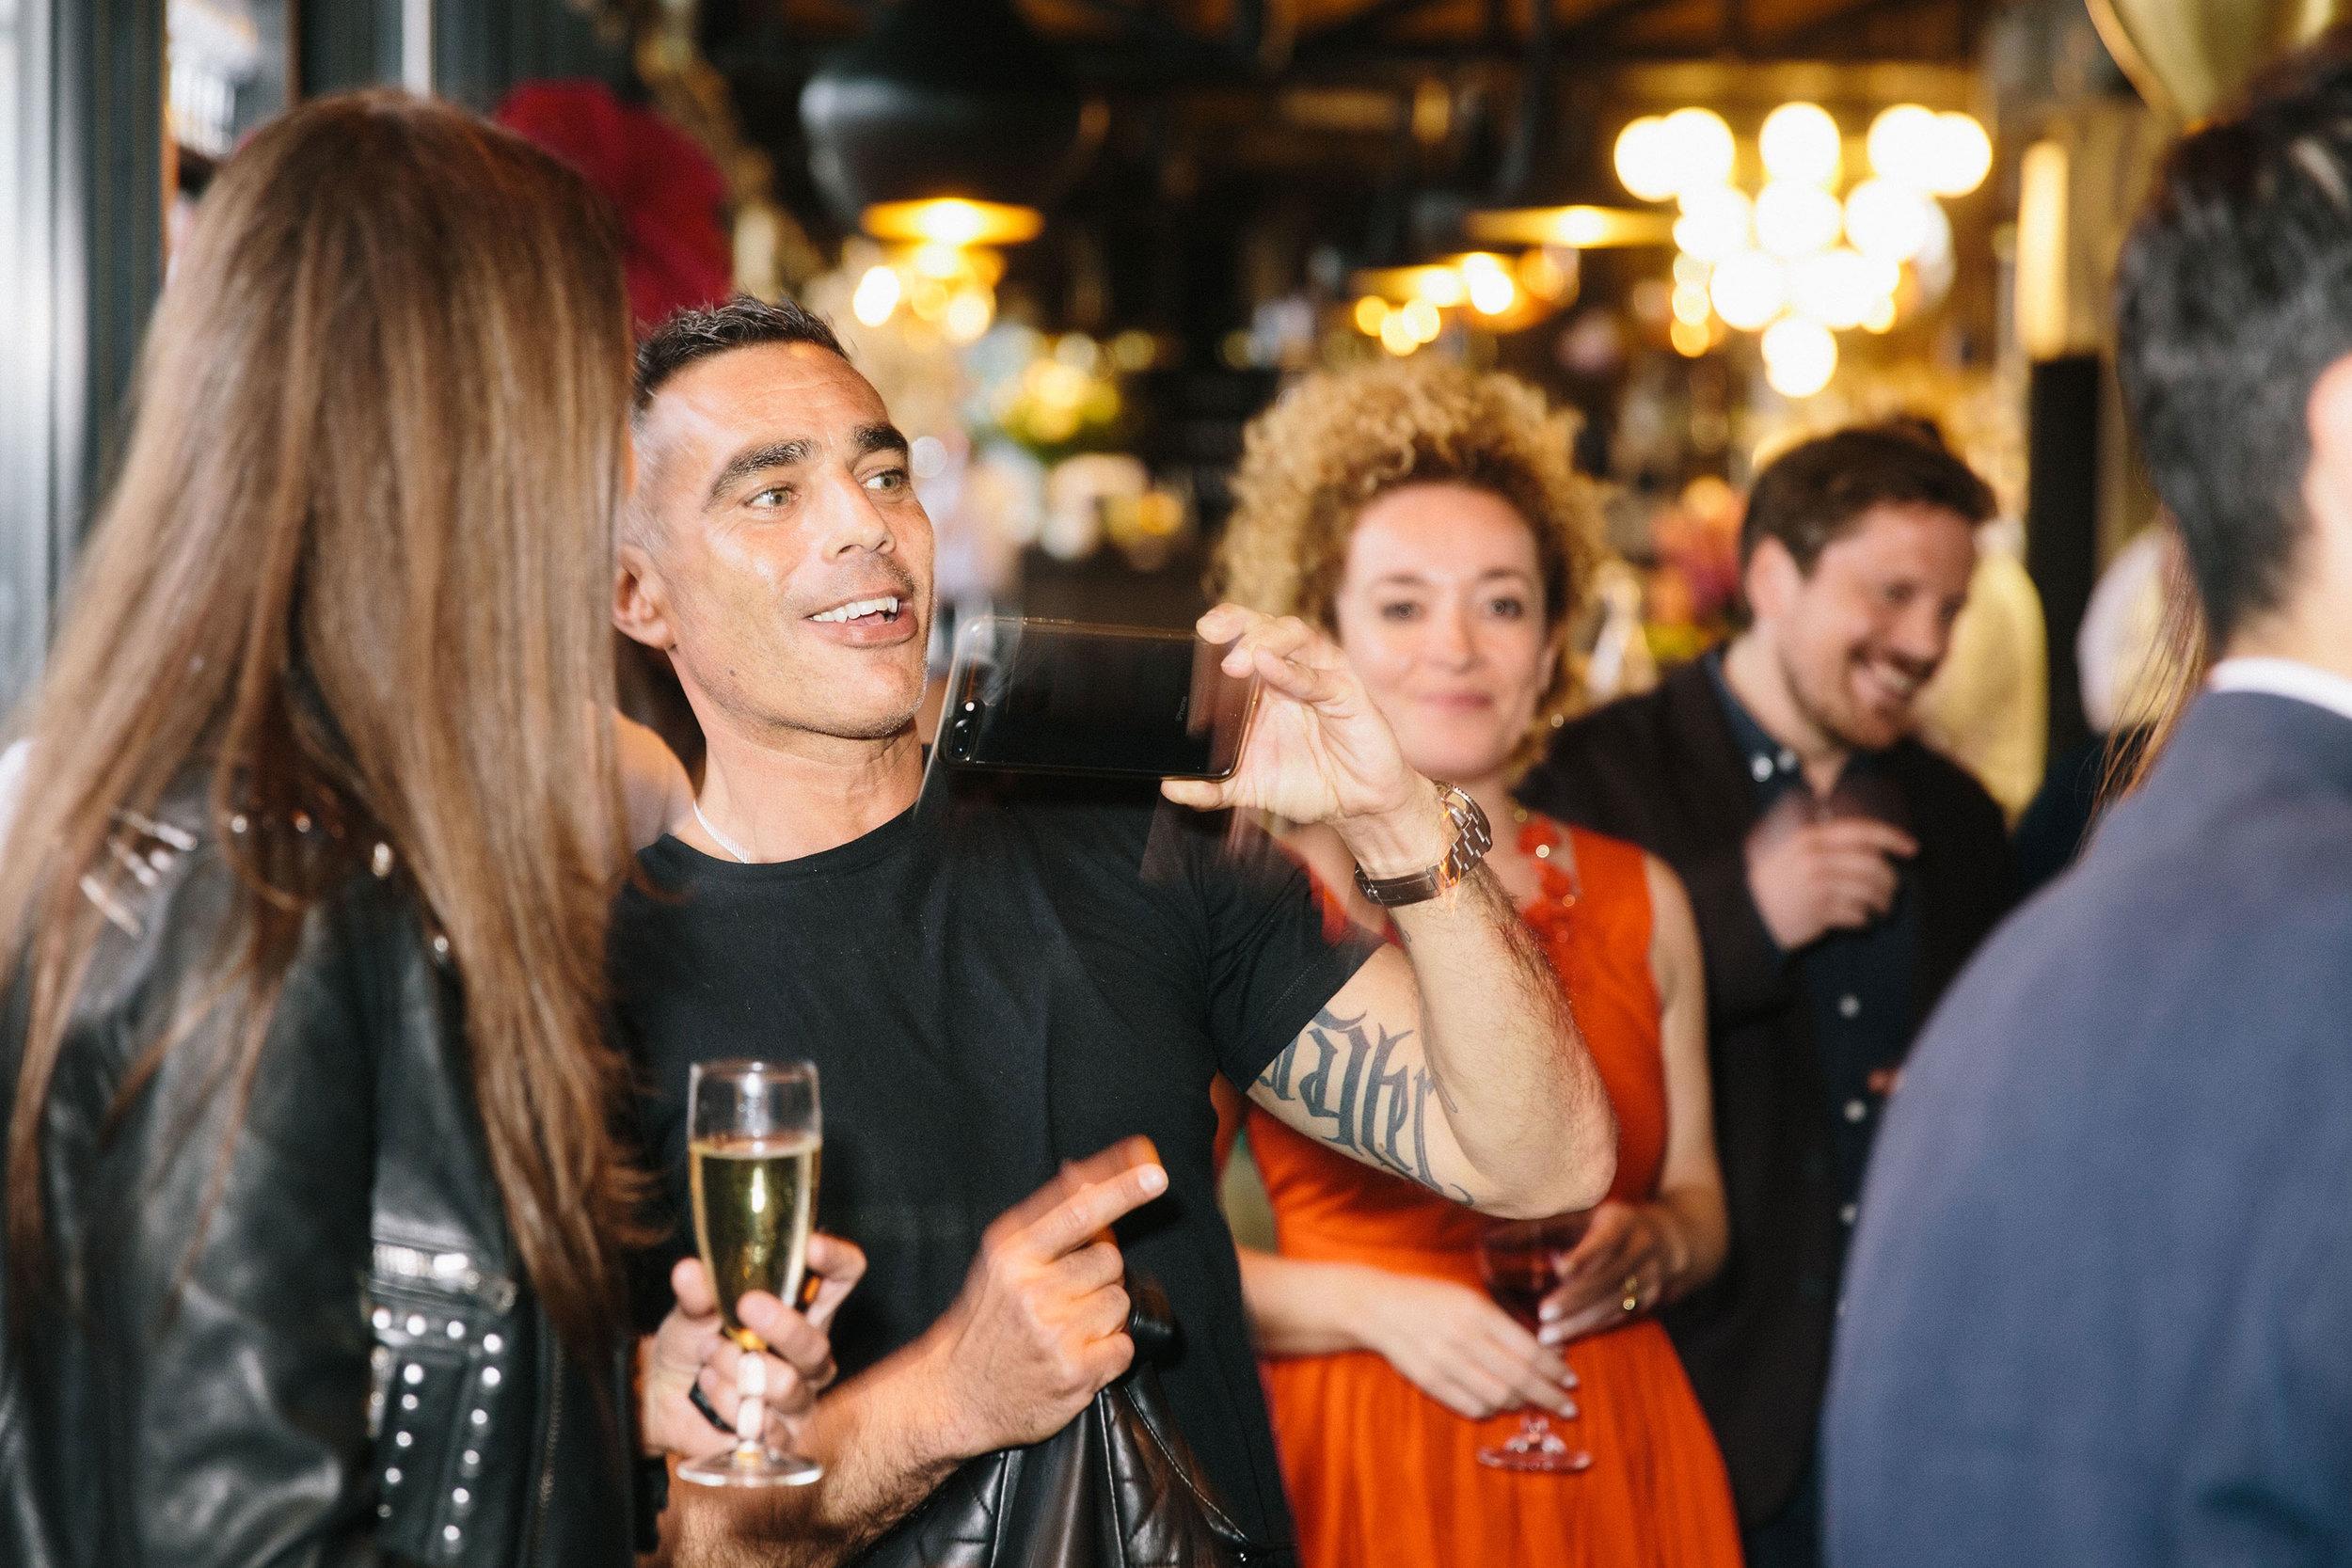 West-London-wedding-party-in-Ladbroke-Grove-Michael-Newington-Gray-64.jpg